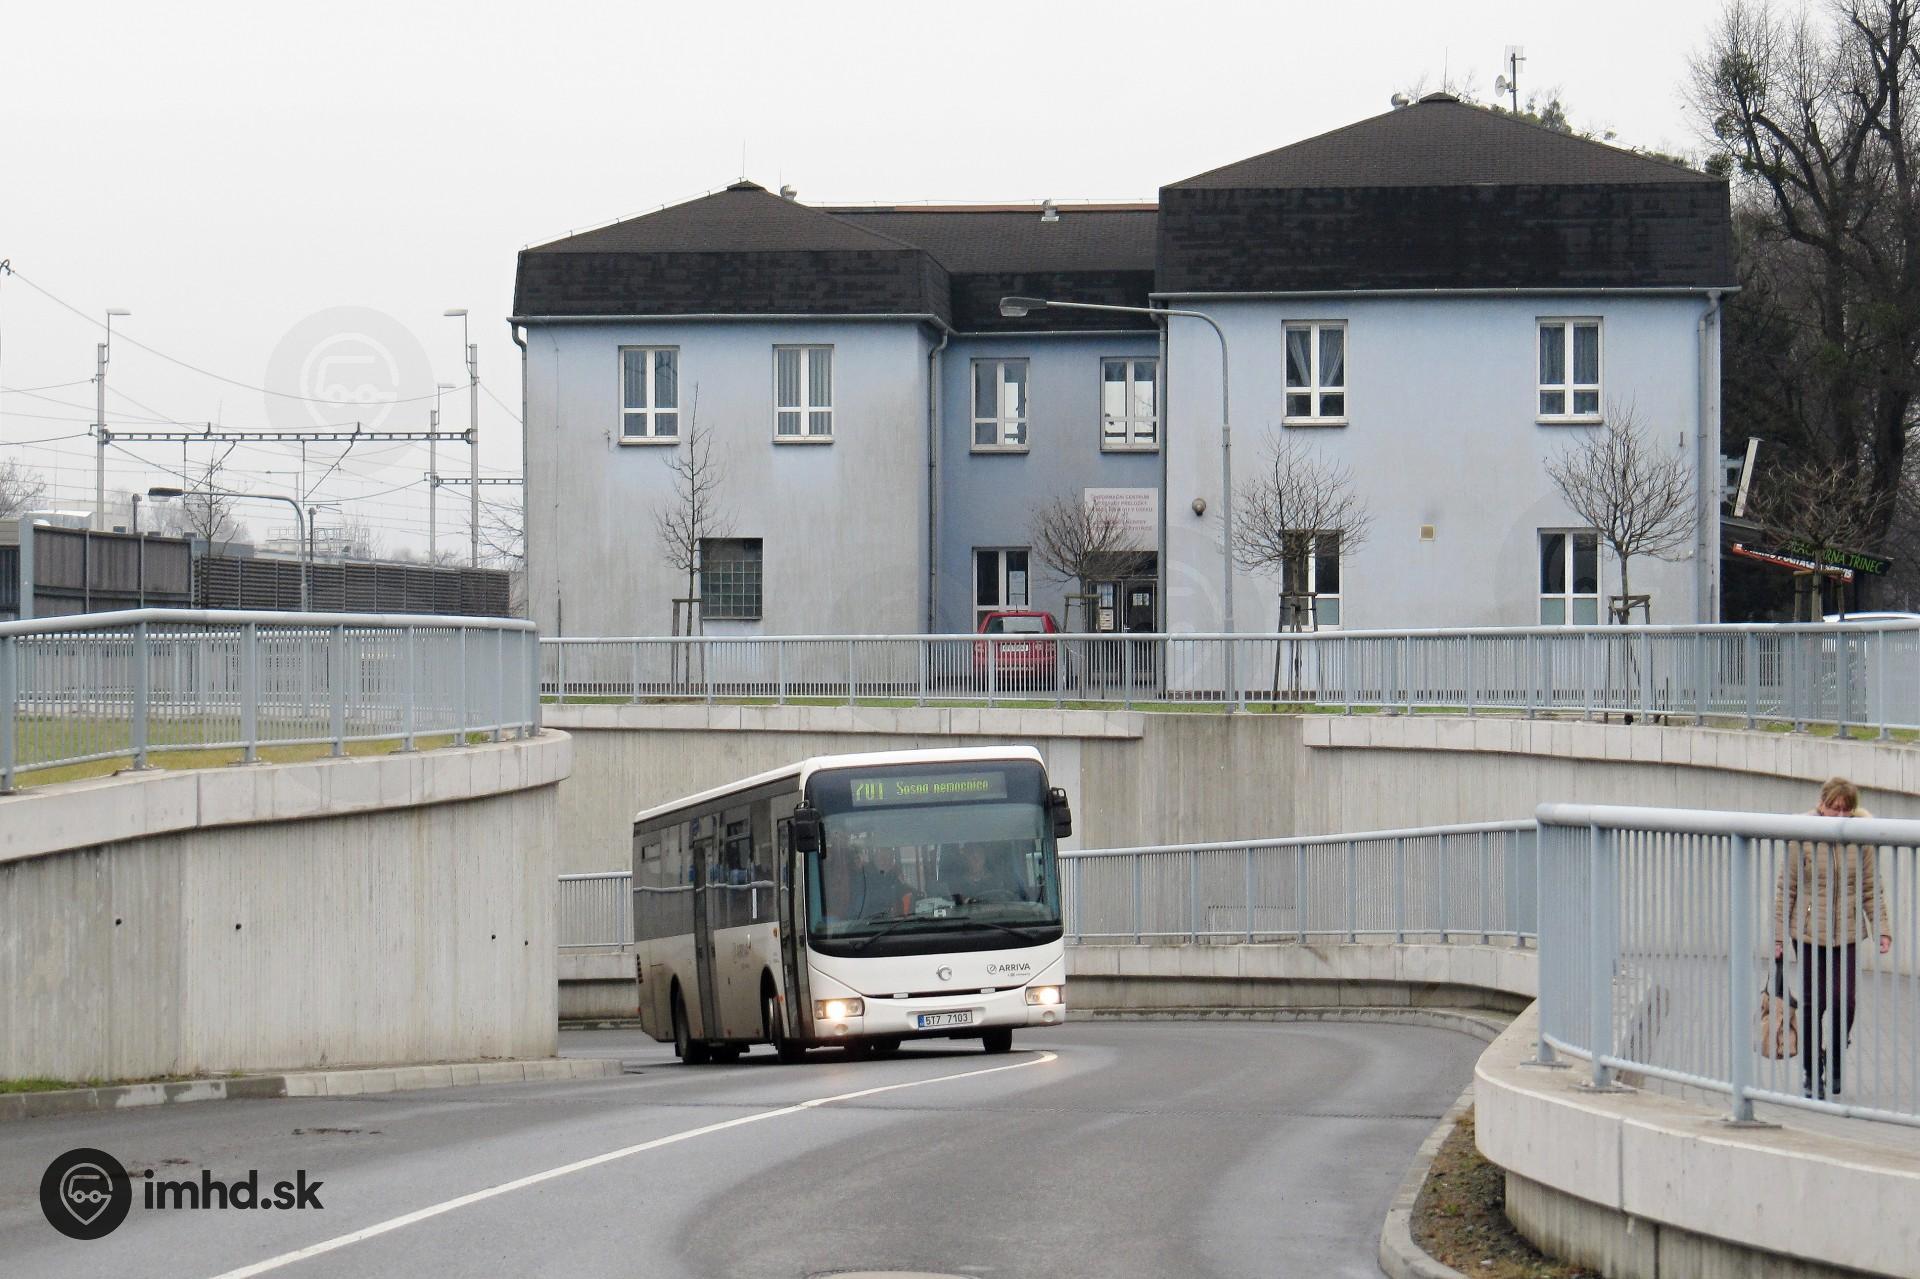 5T7 7103, route 701, Lyžbice • imhd sk Banská Bystrica